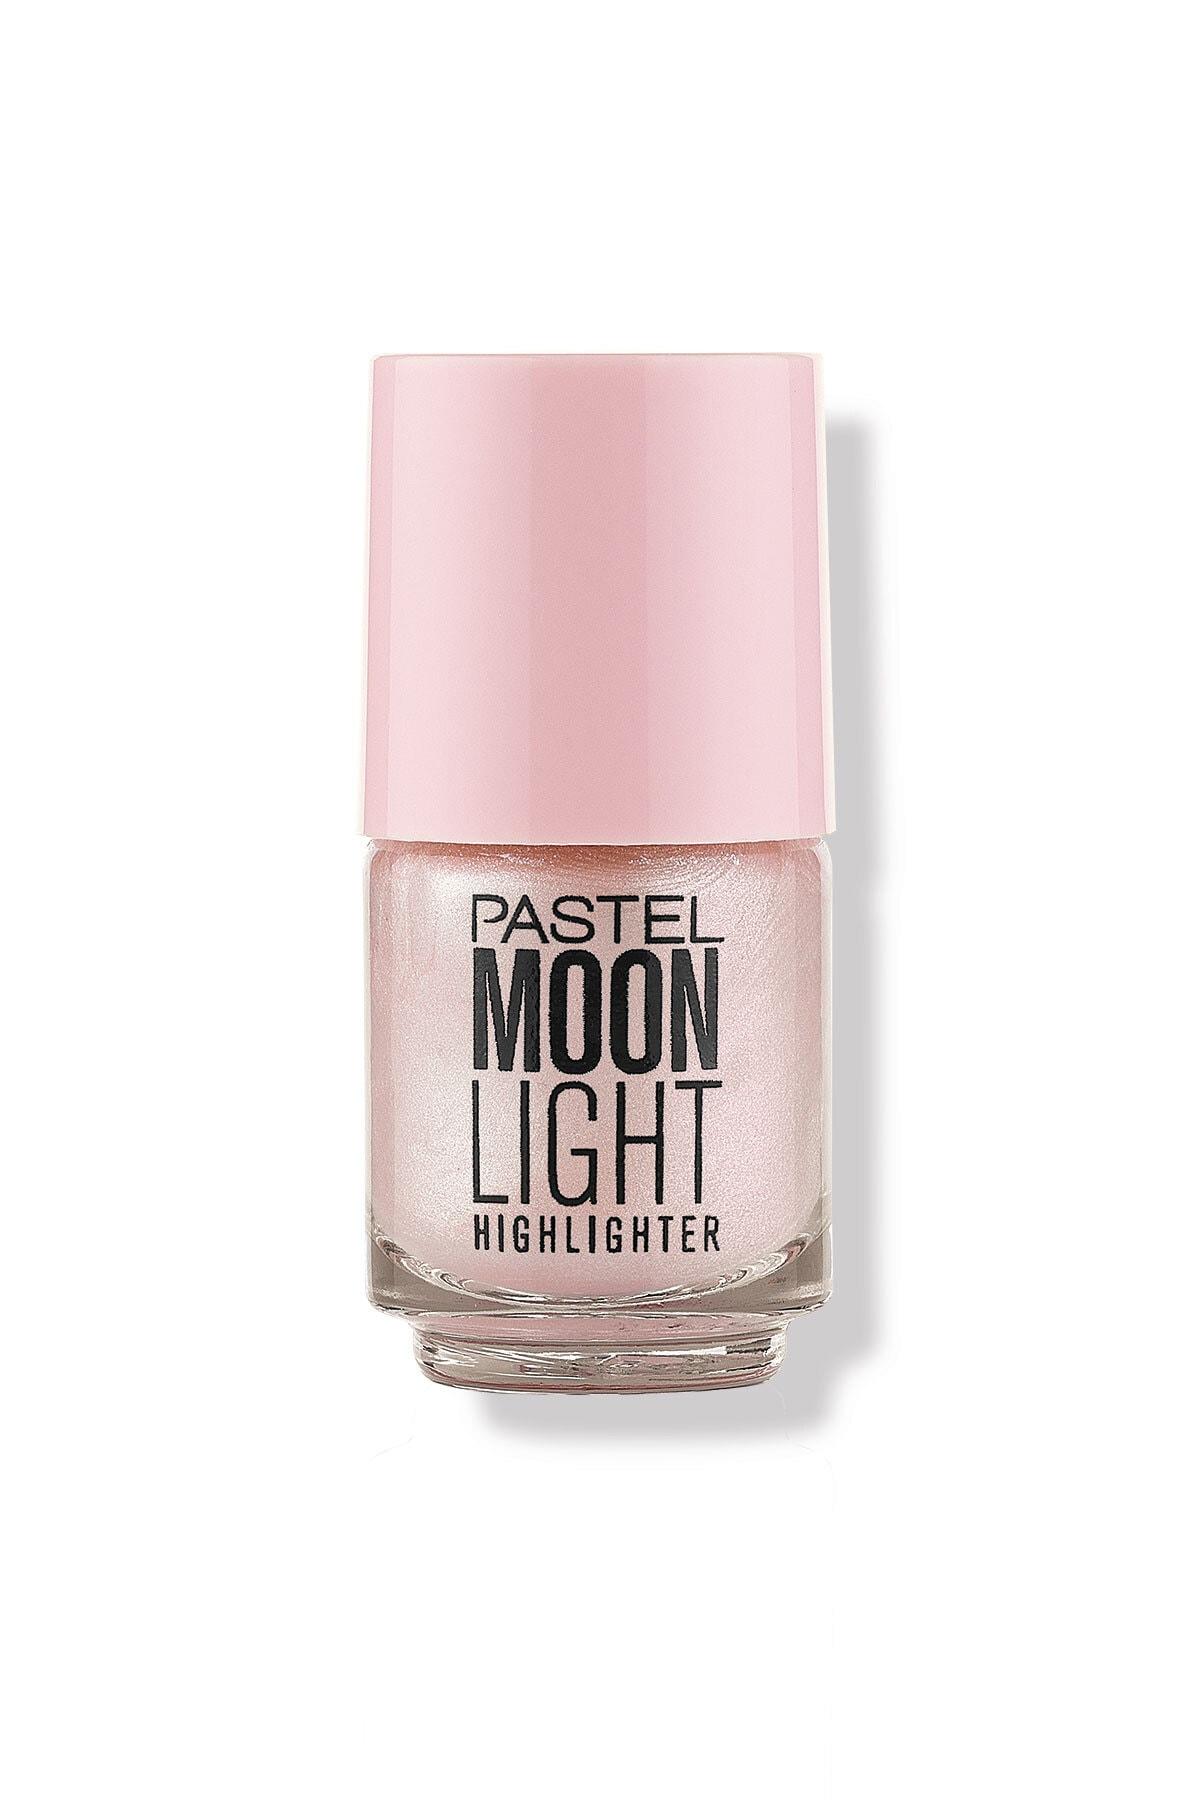 Pastel Likit Aydınlatıcı - Moon Light Highlighter 4.2 ml 8690644368004 1